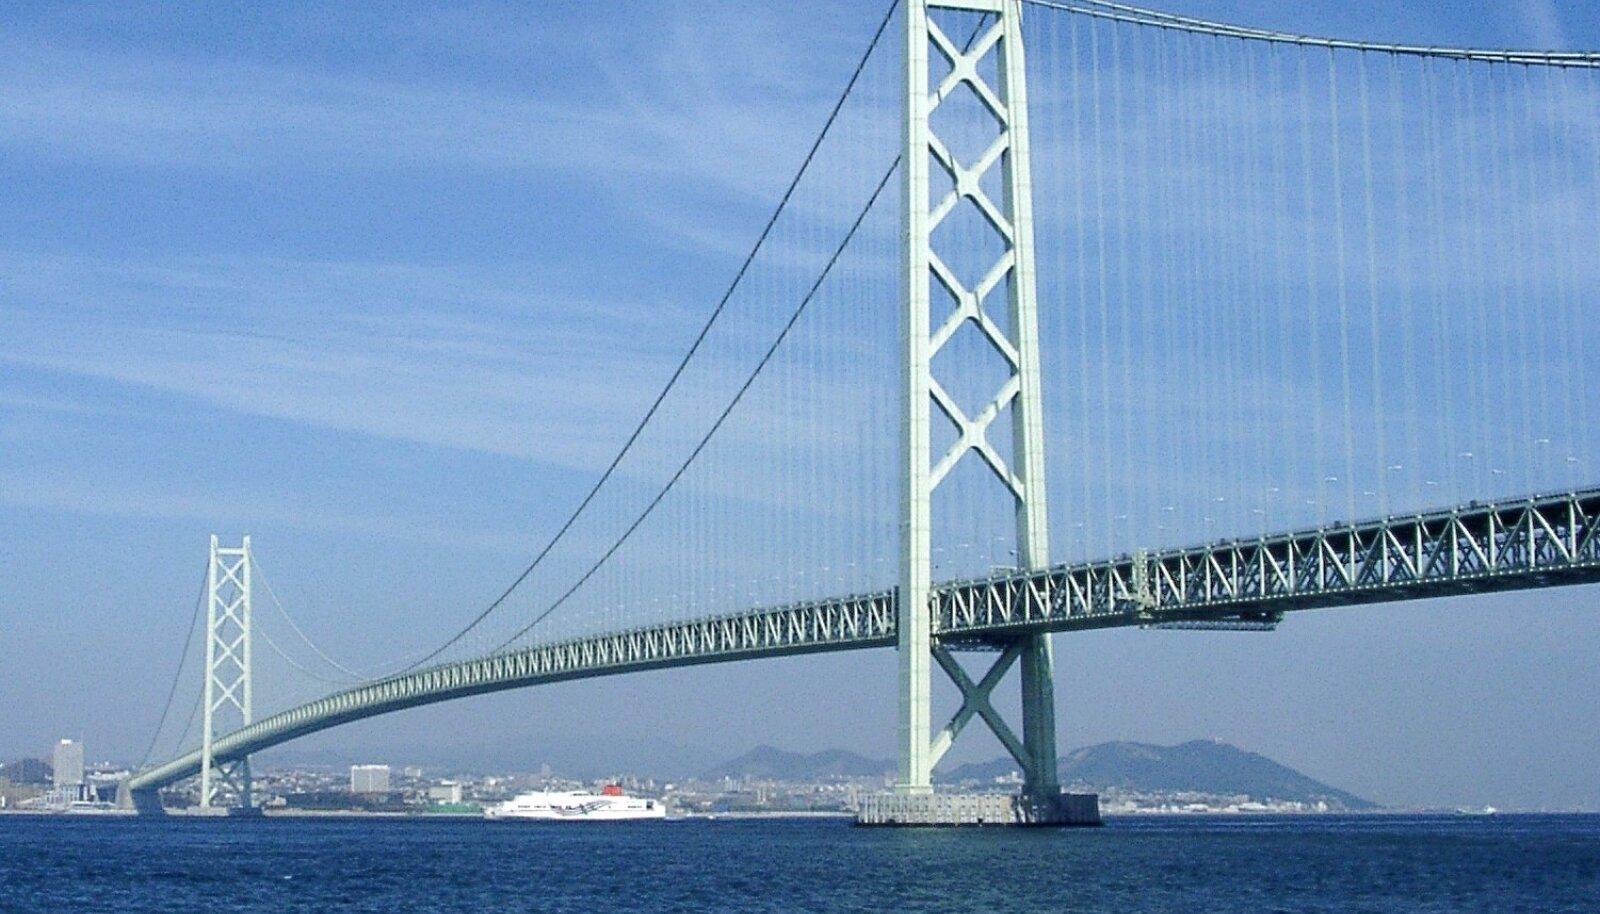 Maailma pikim rippsild Akashi Kaikyō (foto: Pinqui / CC BY-SA 4.0 / Wikimedia Commons)